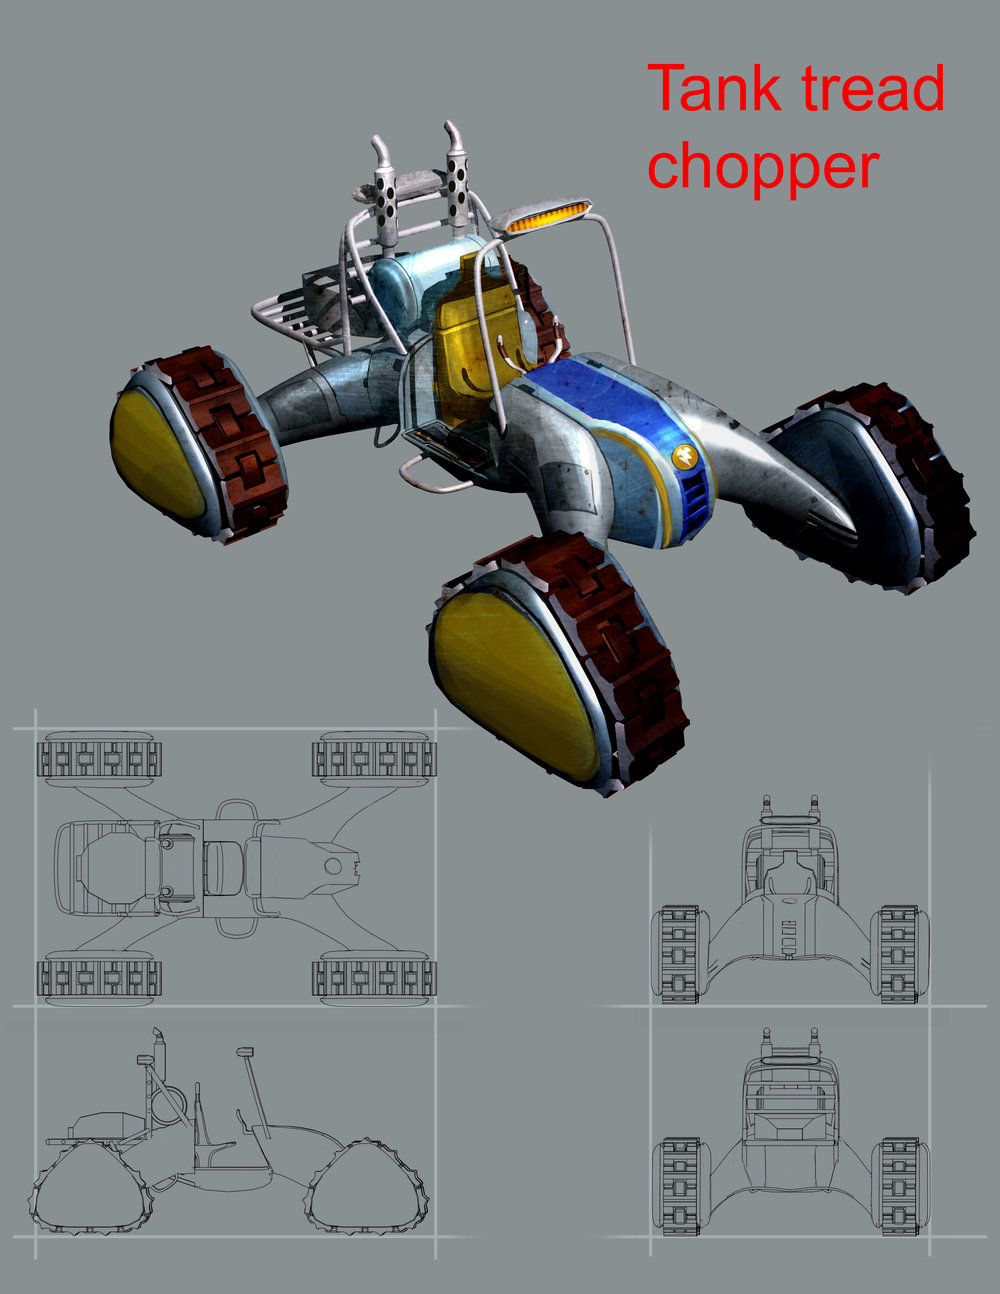 tank-tread-chopper.jpg